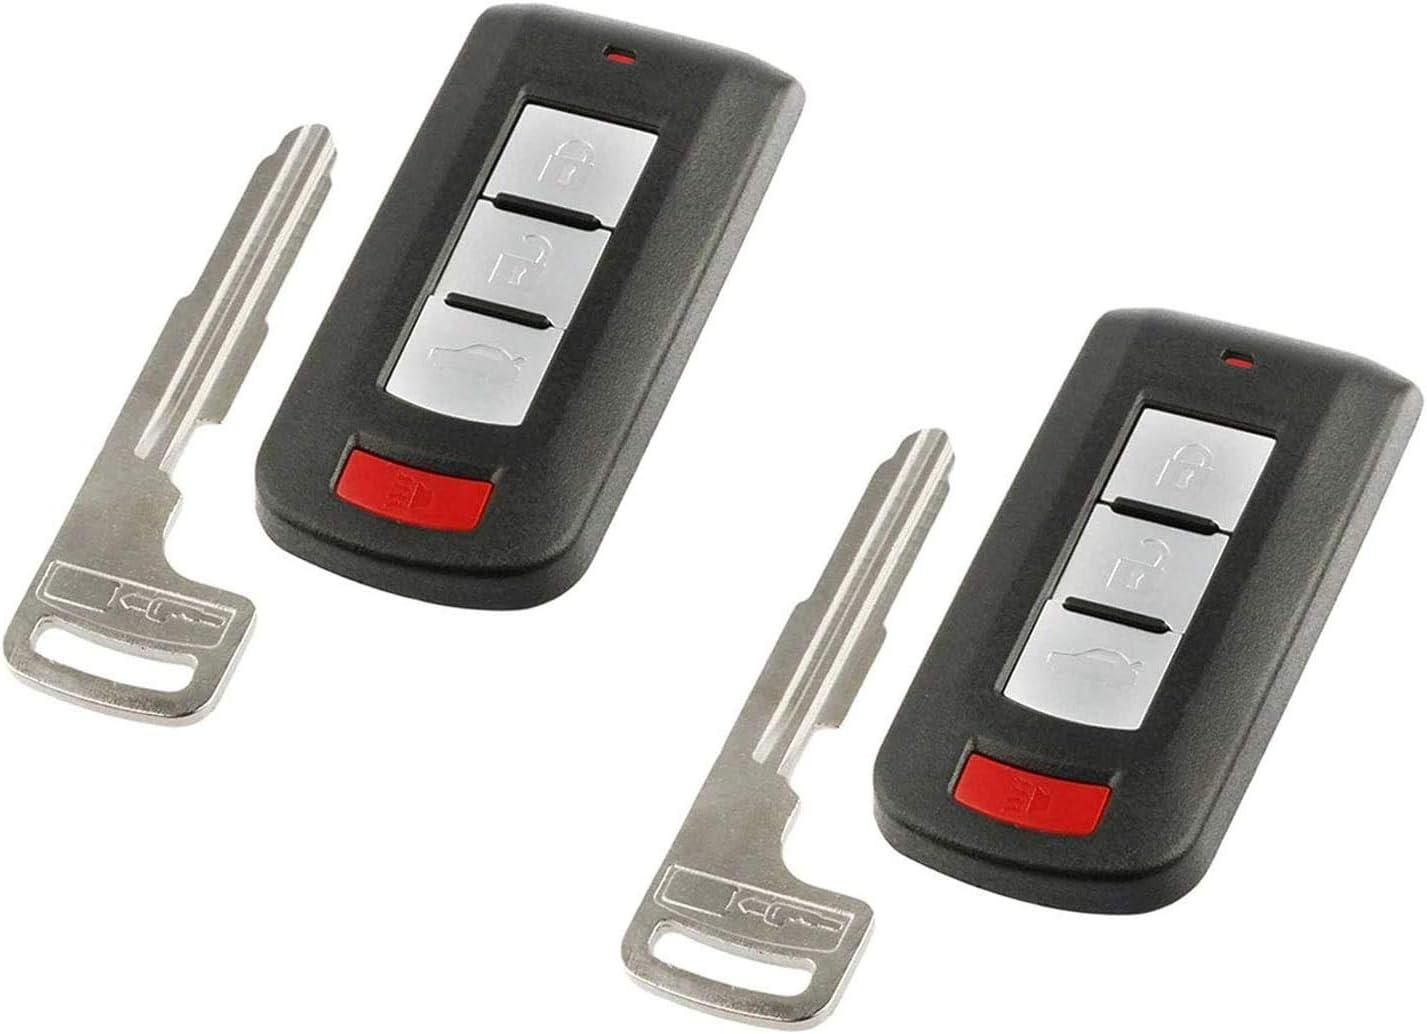 2 Pack New fits 2008-2017 Mitsubishi Outlander Lancer Smart Key Fob Keyless Entry Remote OUC644M-KEY-N